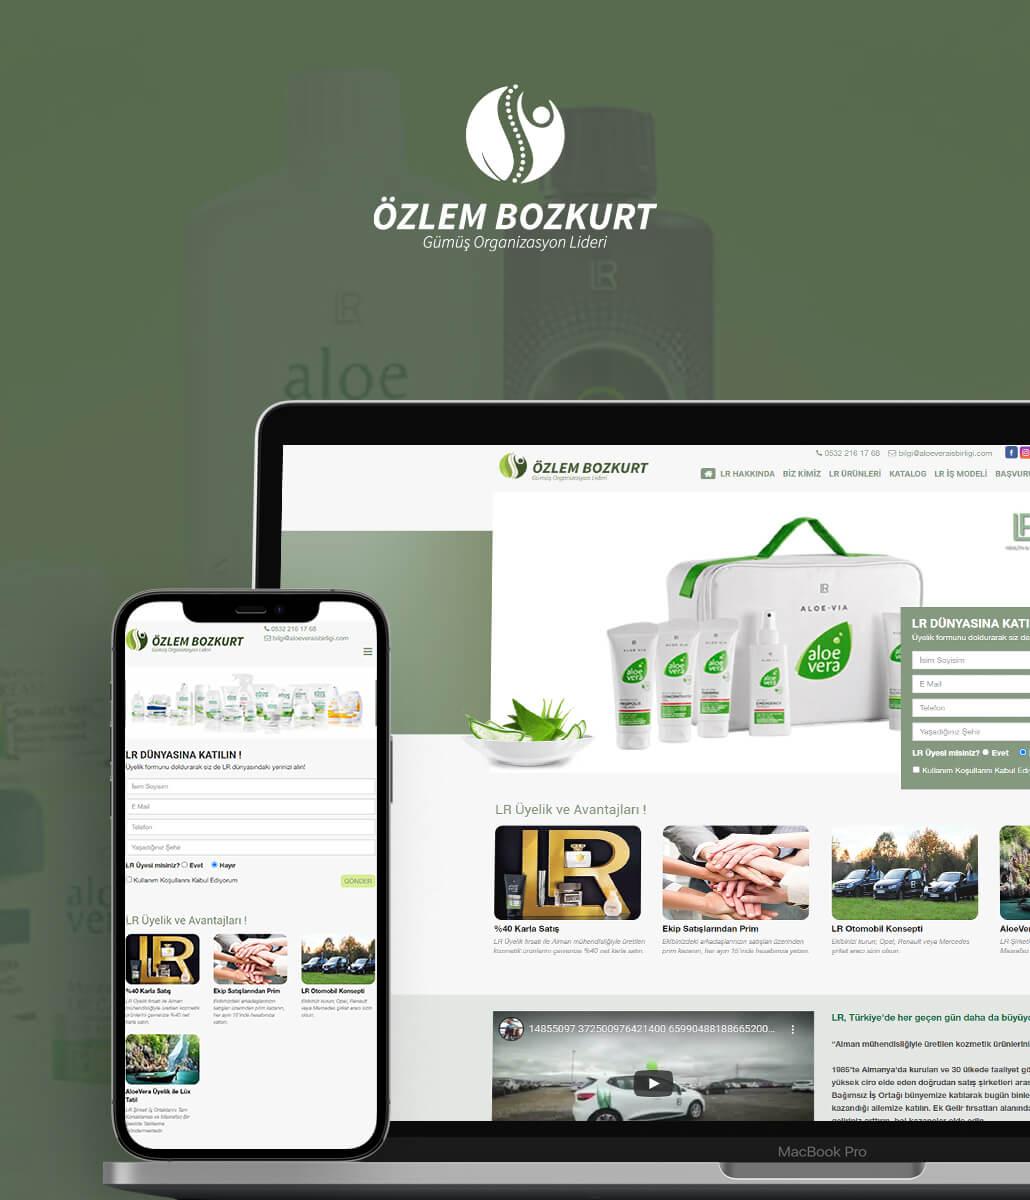 Aloevera Özlem Bozkurt Kurumsal Web Tasarımı